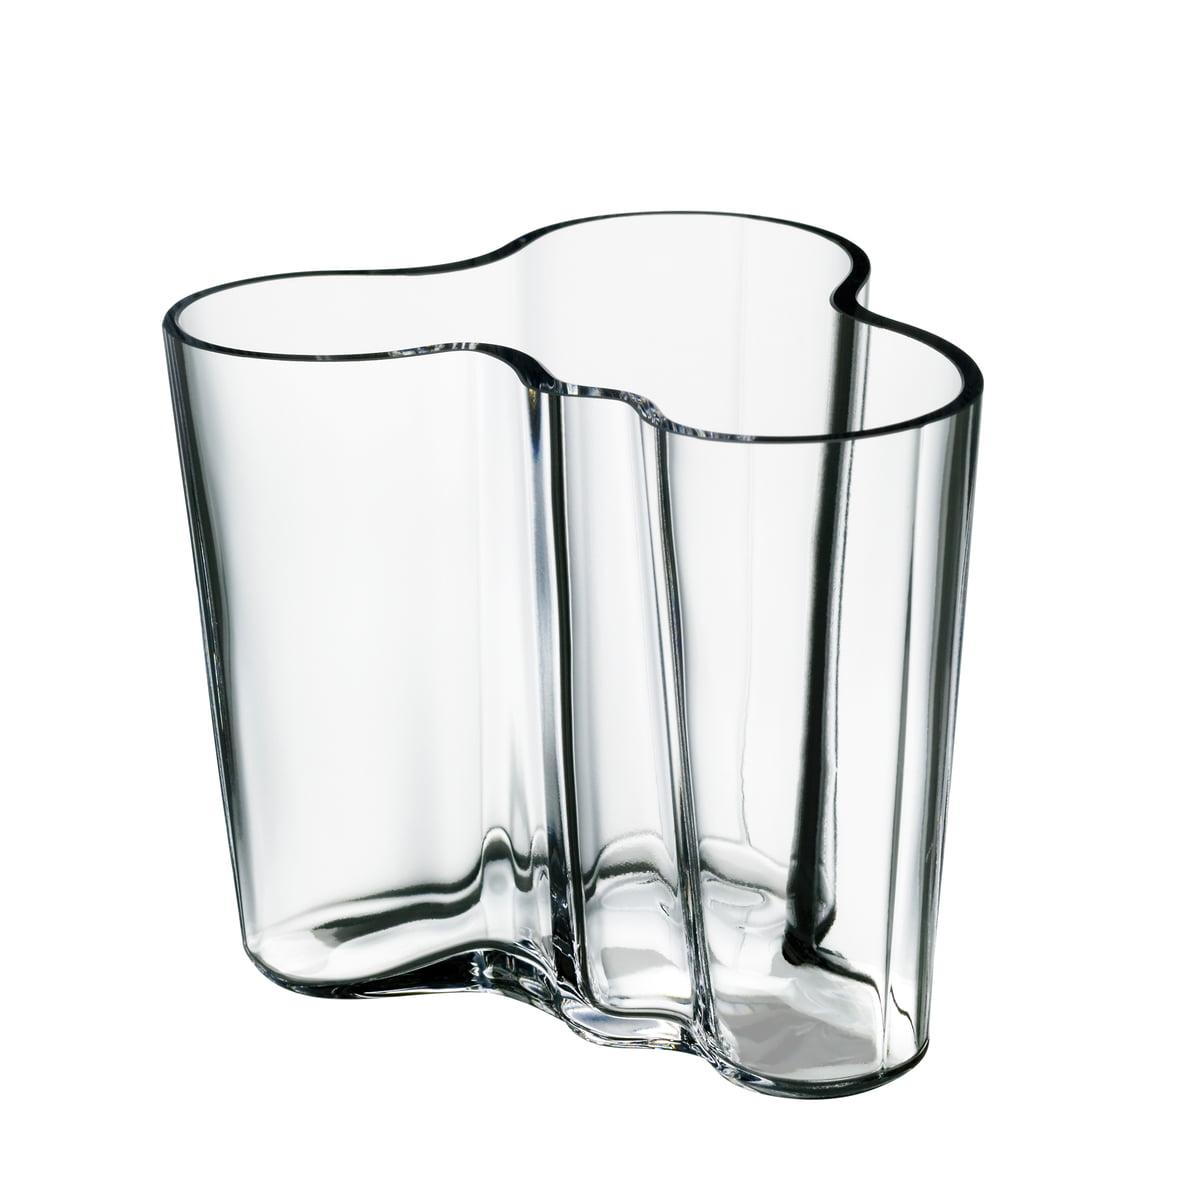 iittala aalto vase savoy clear 95 mm - Aalto Vase